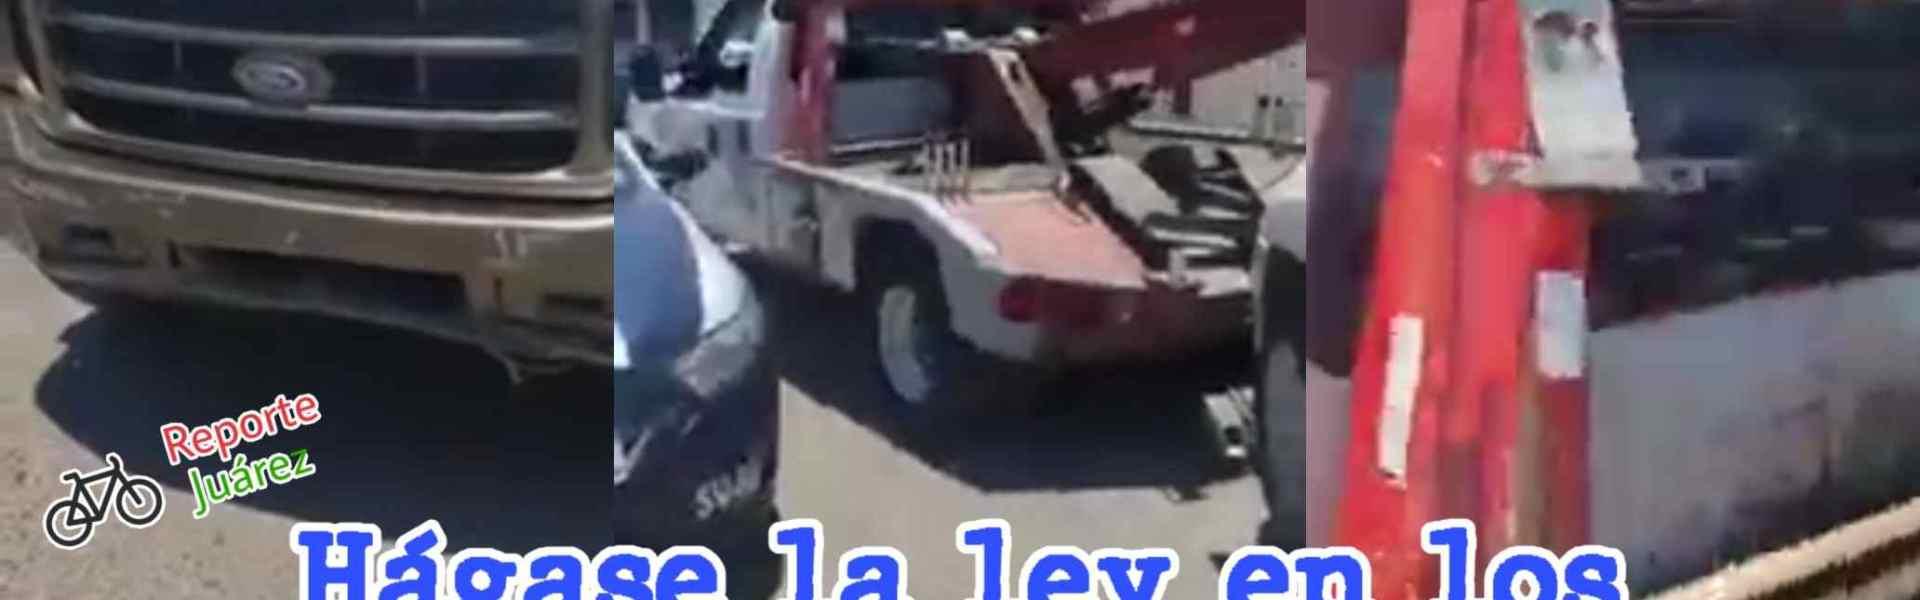 corrupcion ciudad juarez